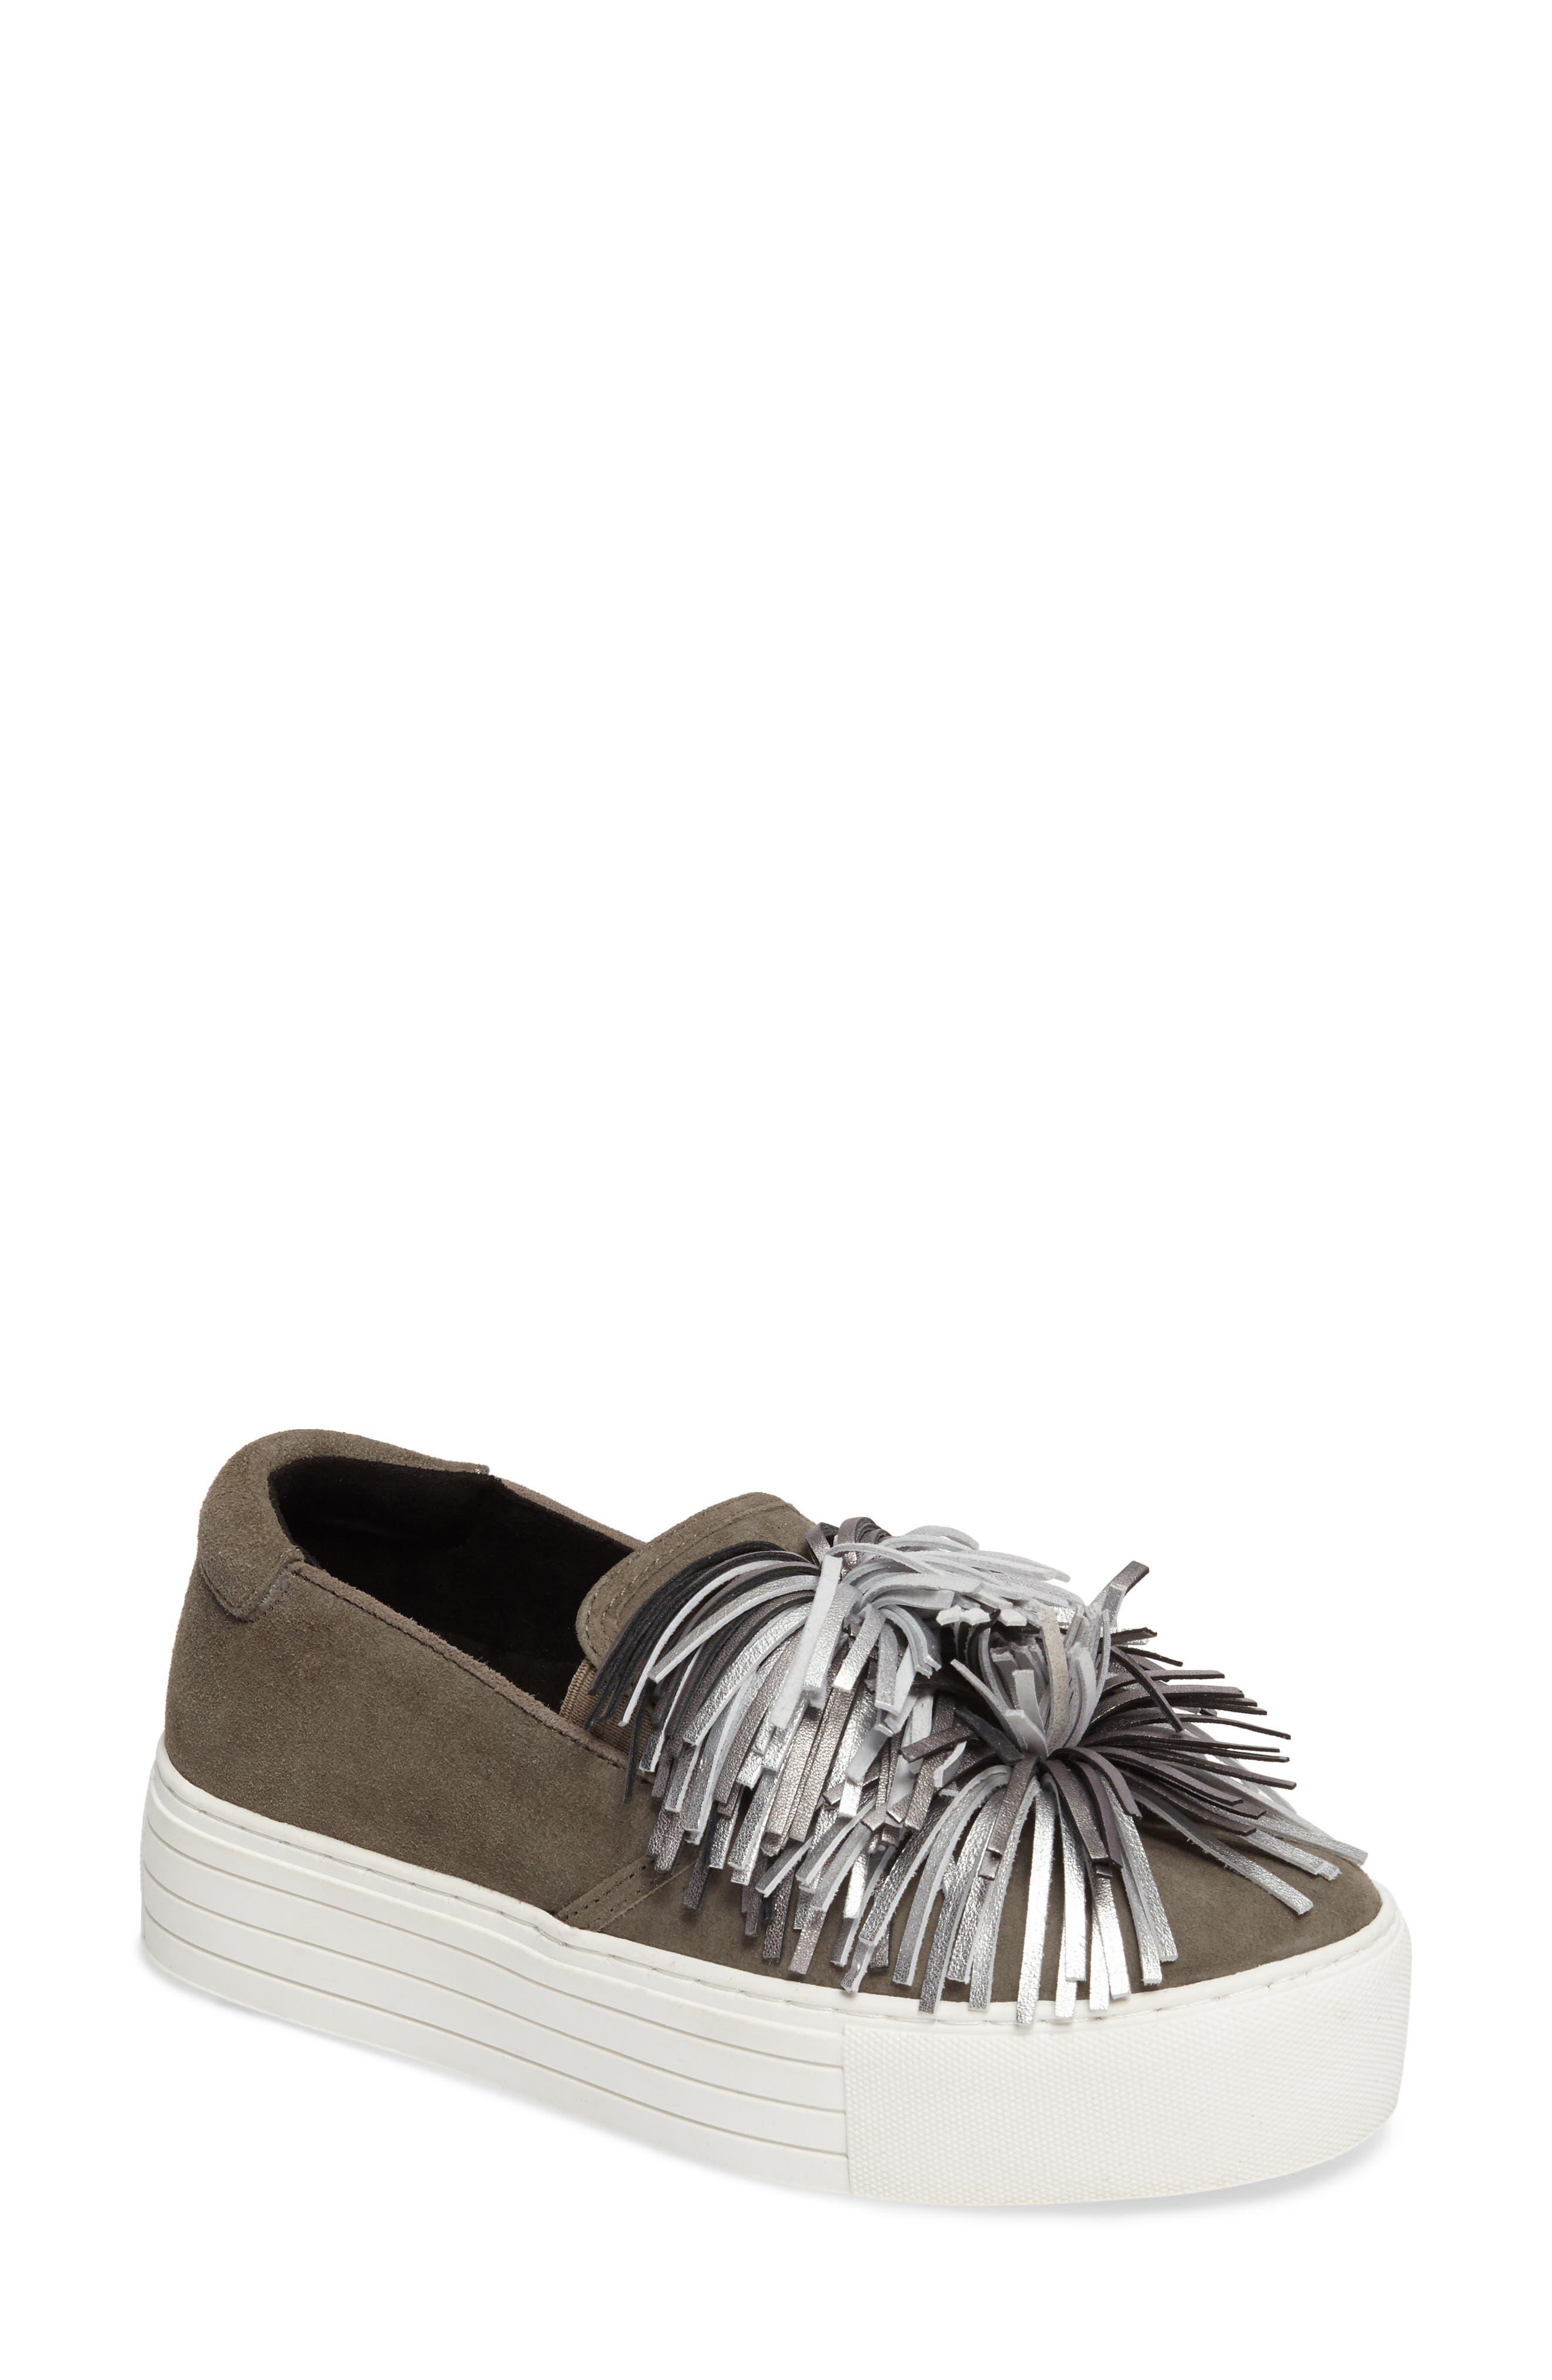 Jayson Pom Platform Sneaker,                         Main,                         color, 090